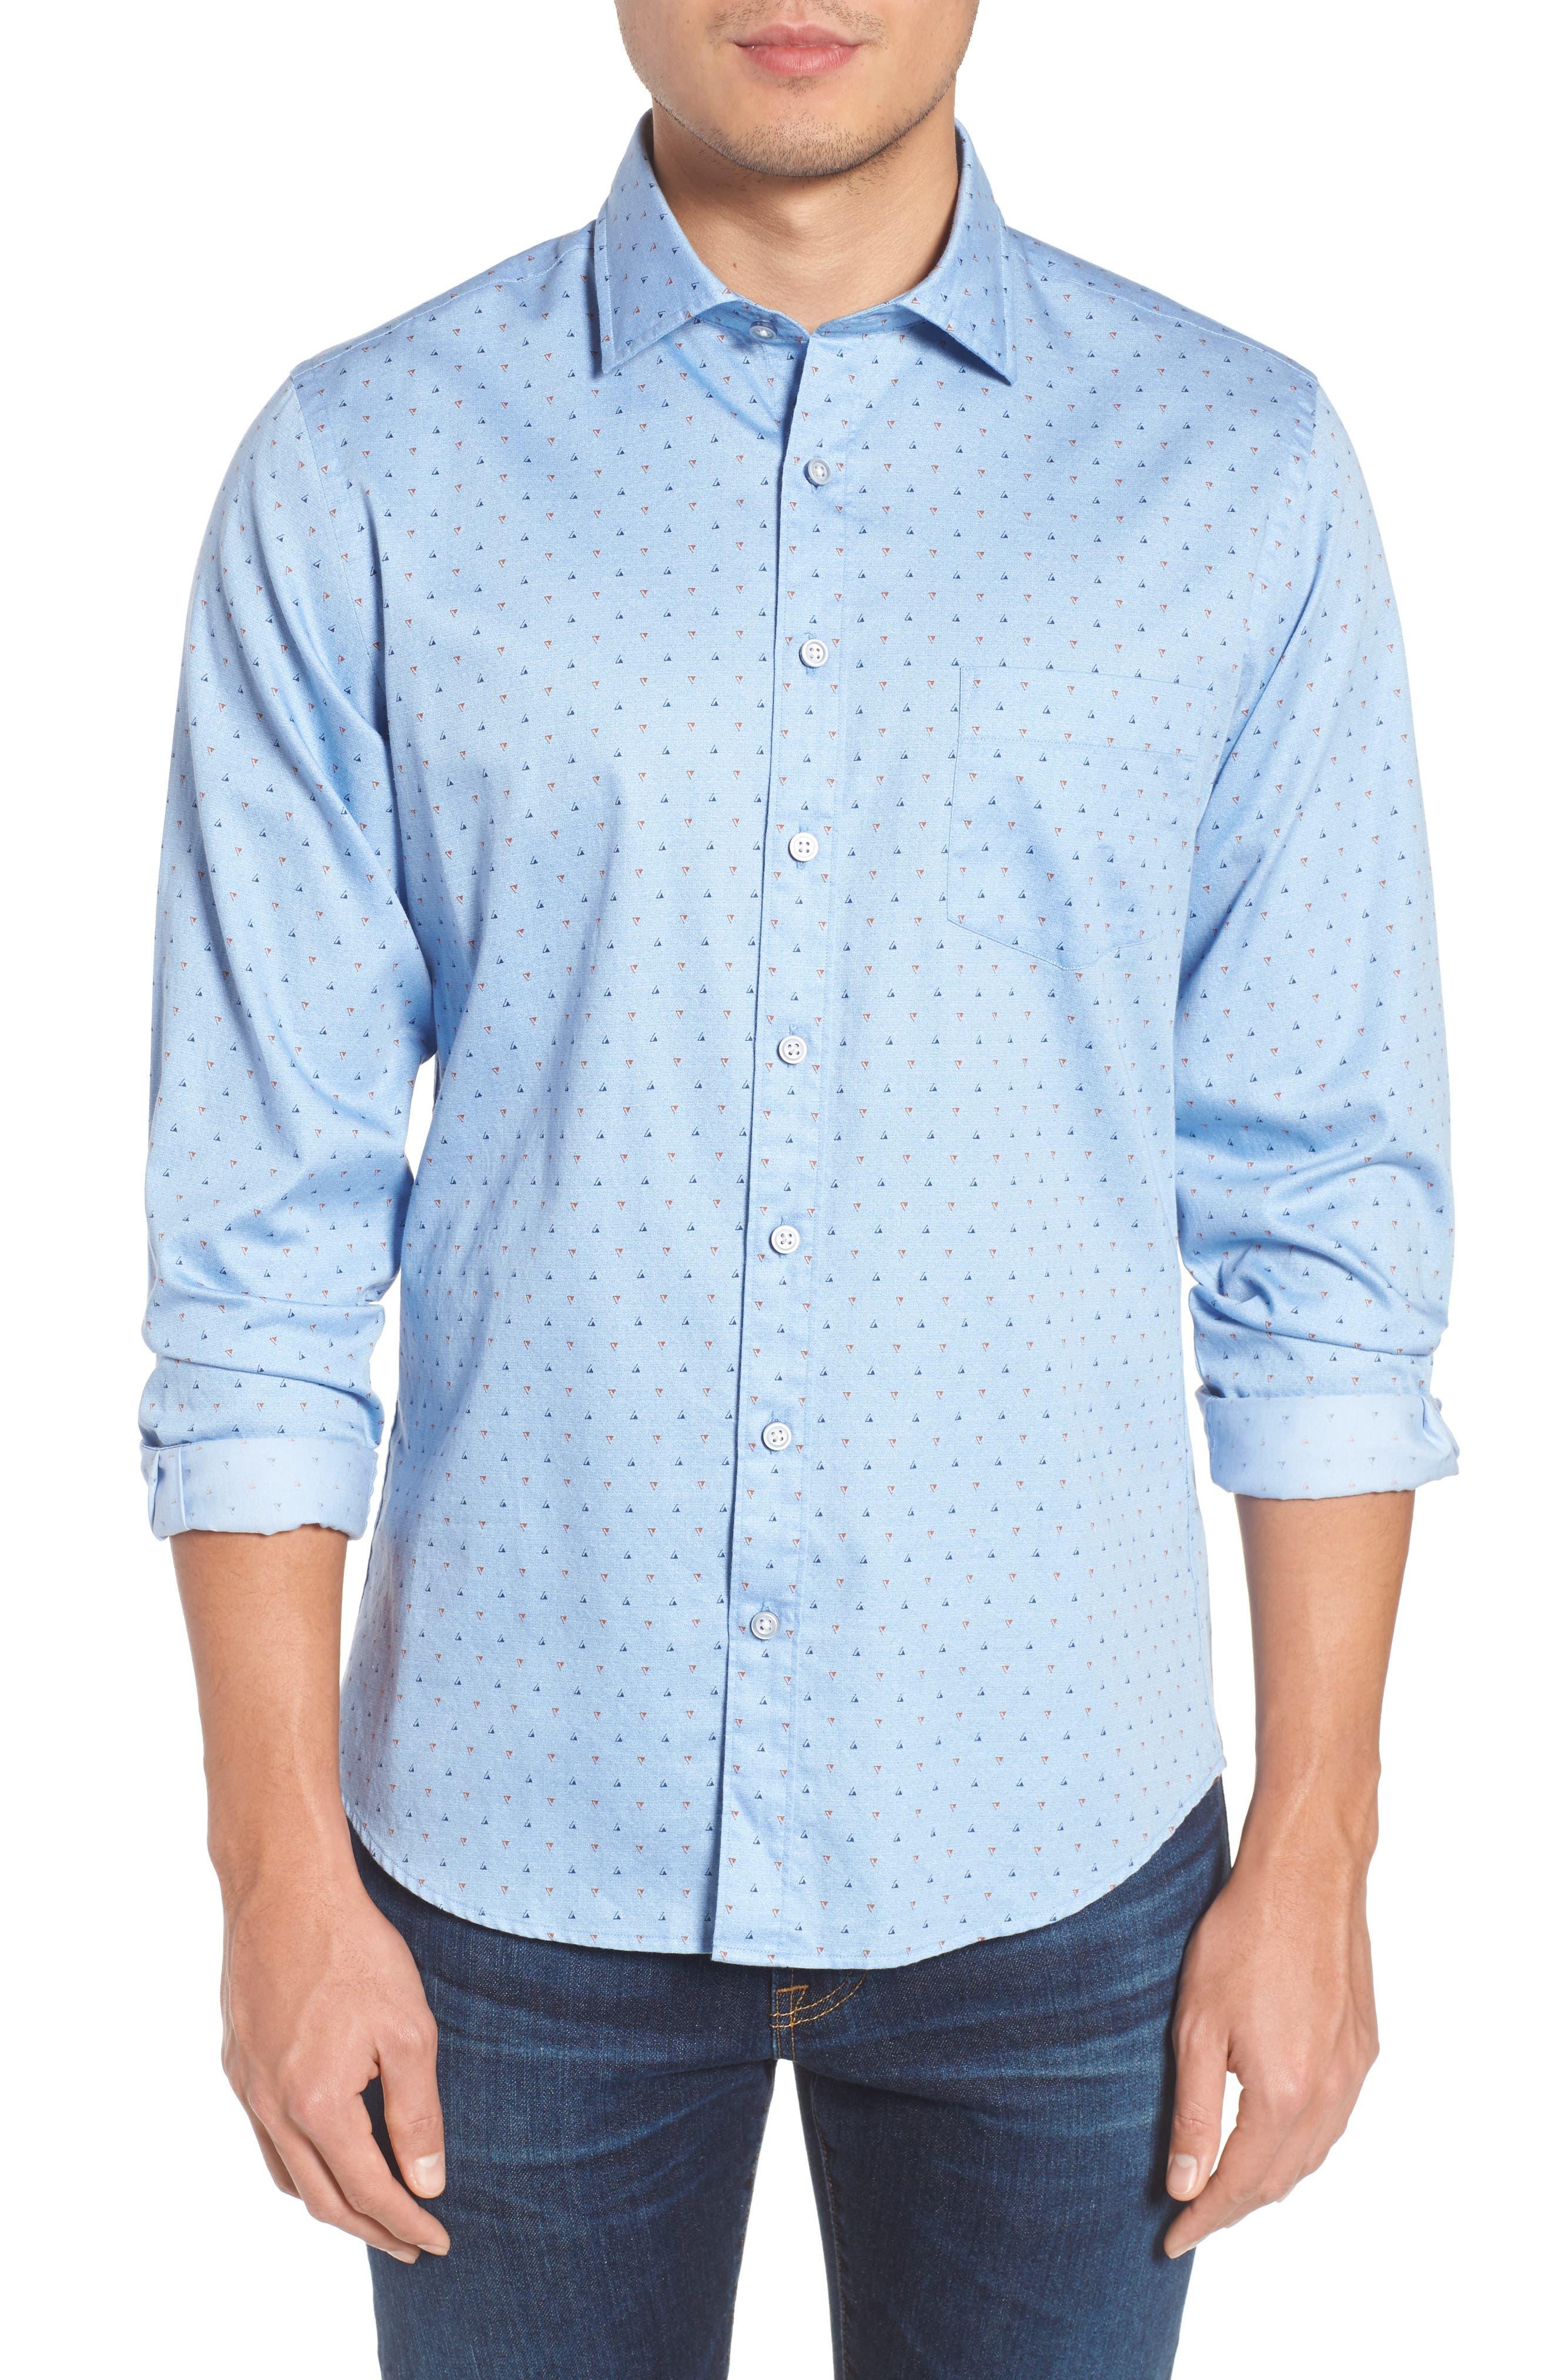 Penzance Regular Fit Sport Shirt,                         Main,                         color, 456